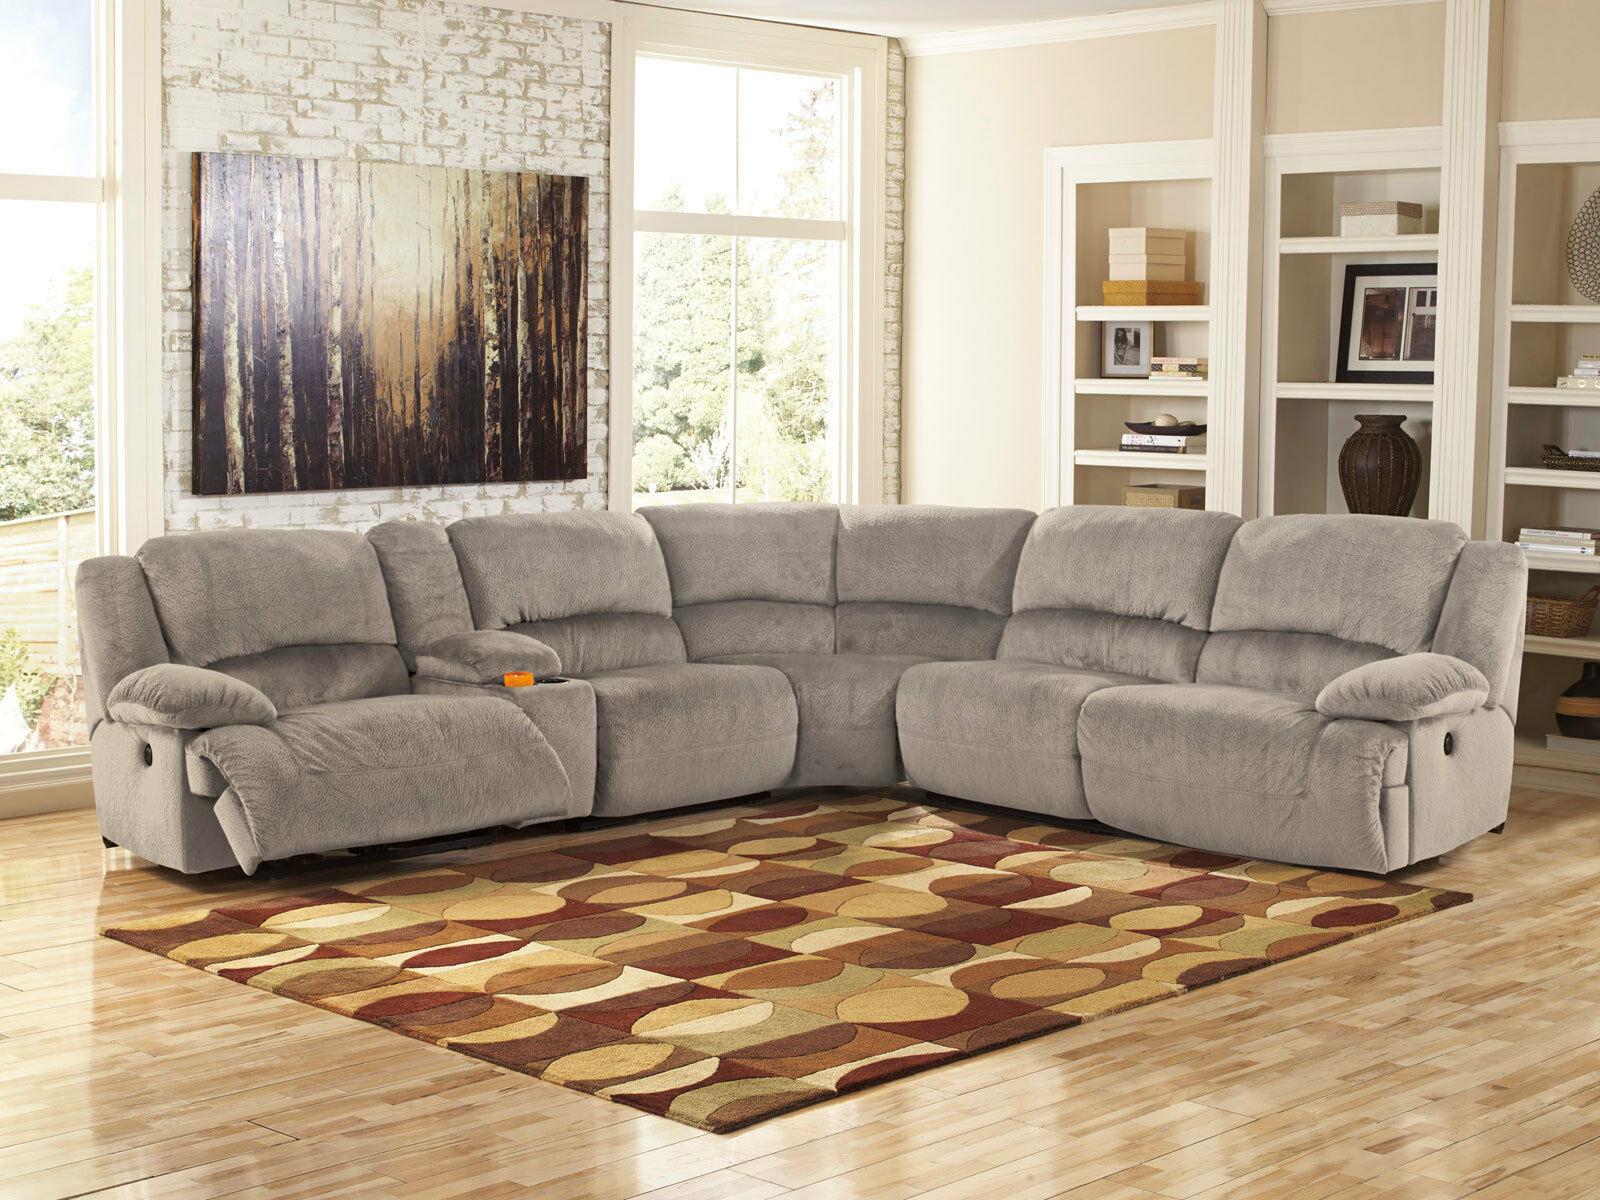 New Walsh 6 Piece Living Room Gray Microfiber Power